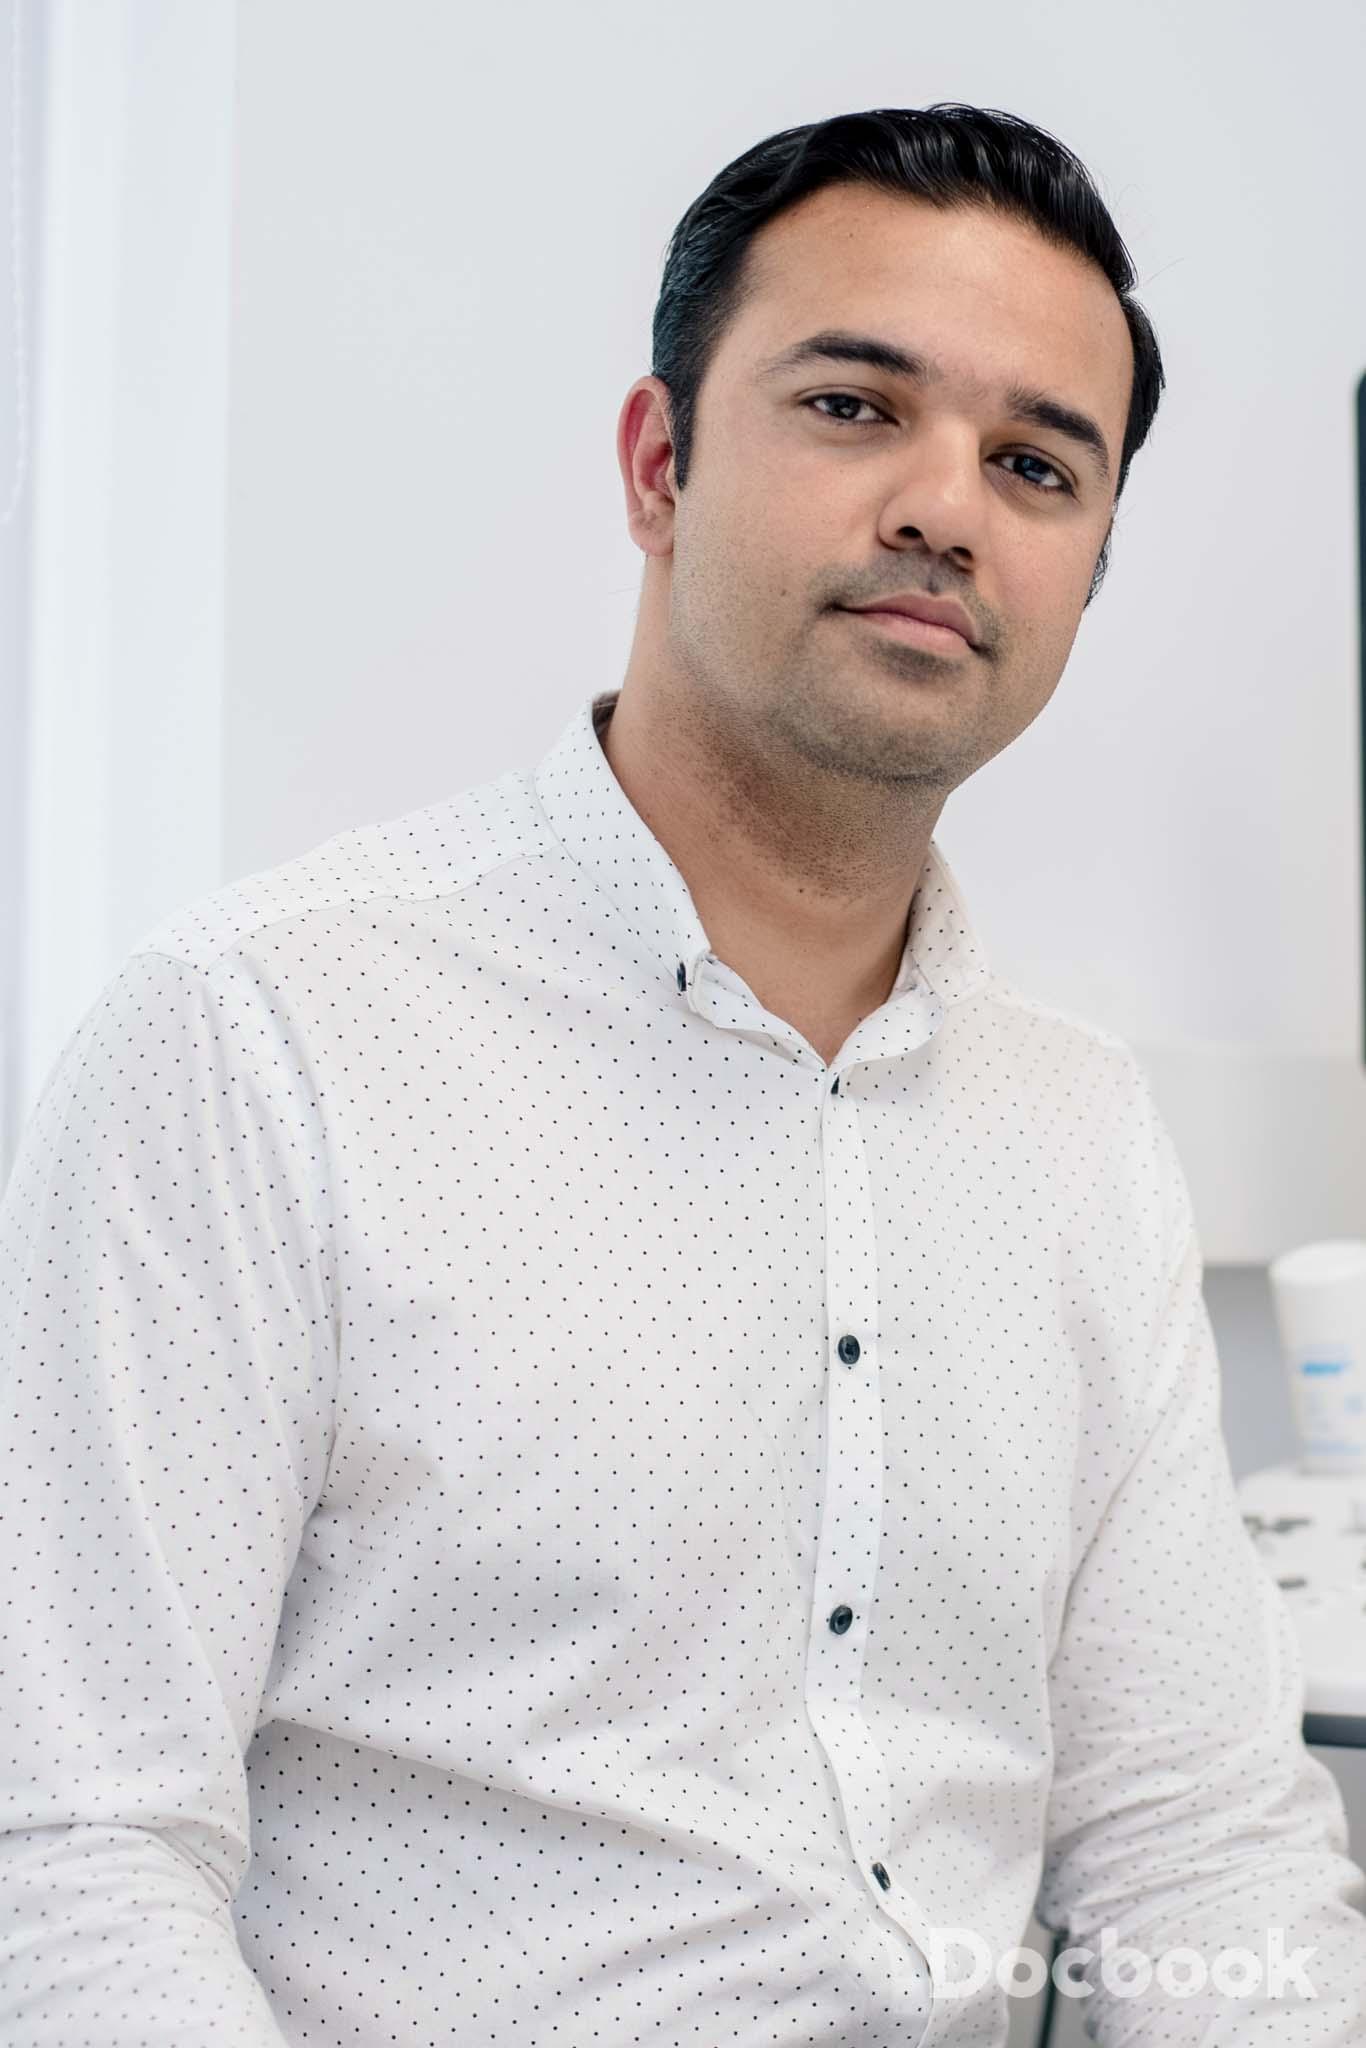 Dr. Vora Prateek